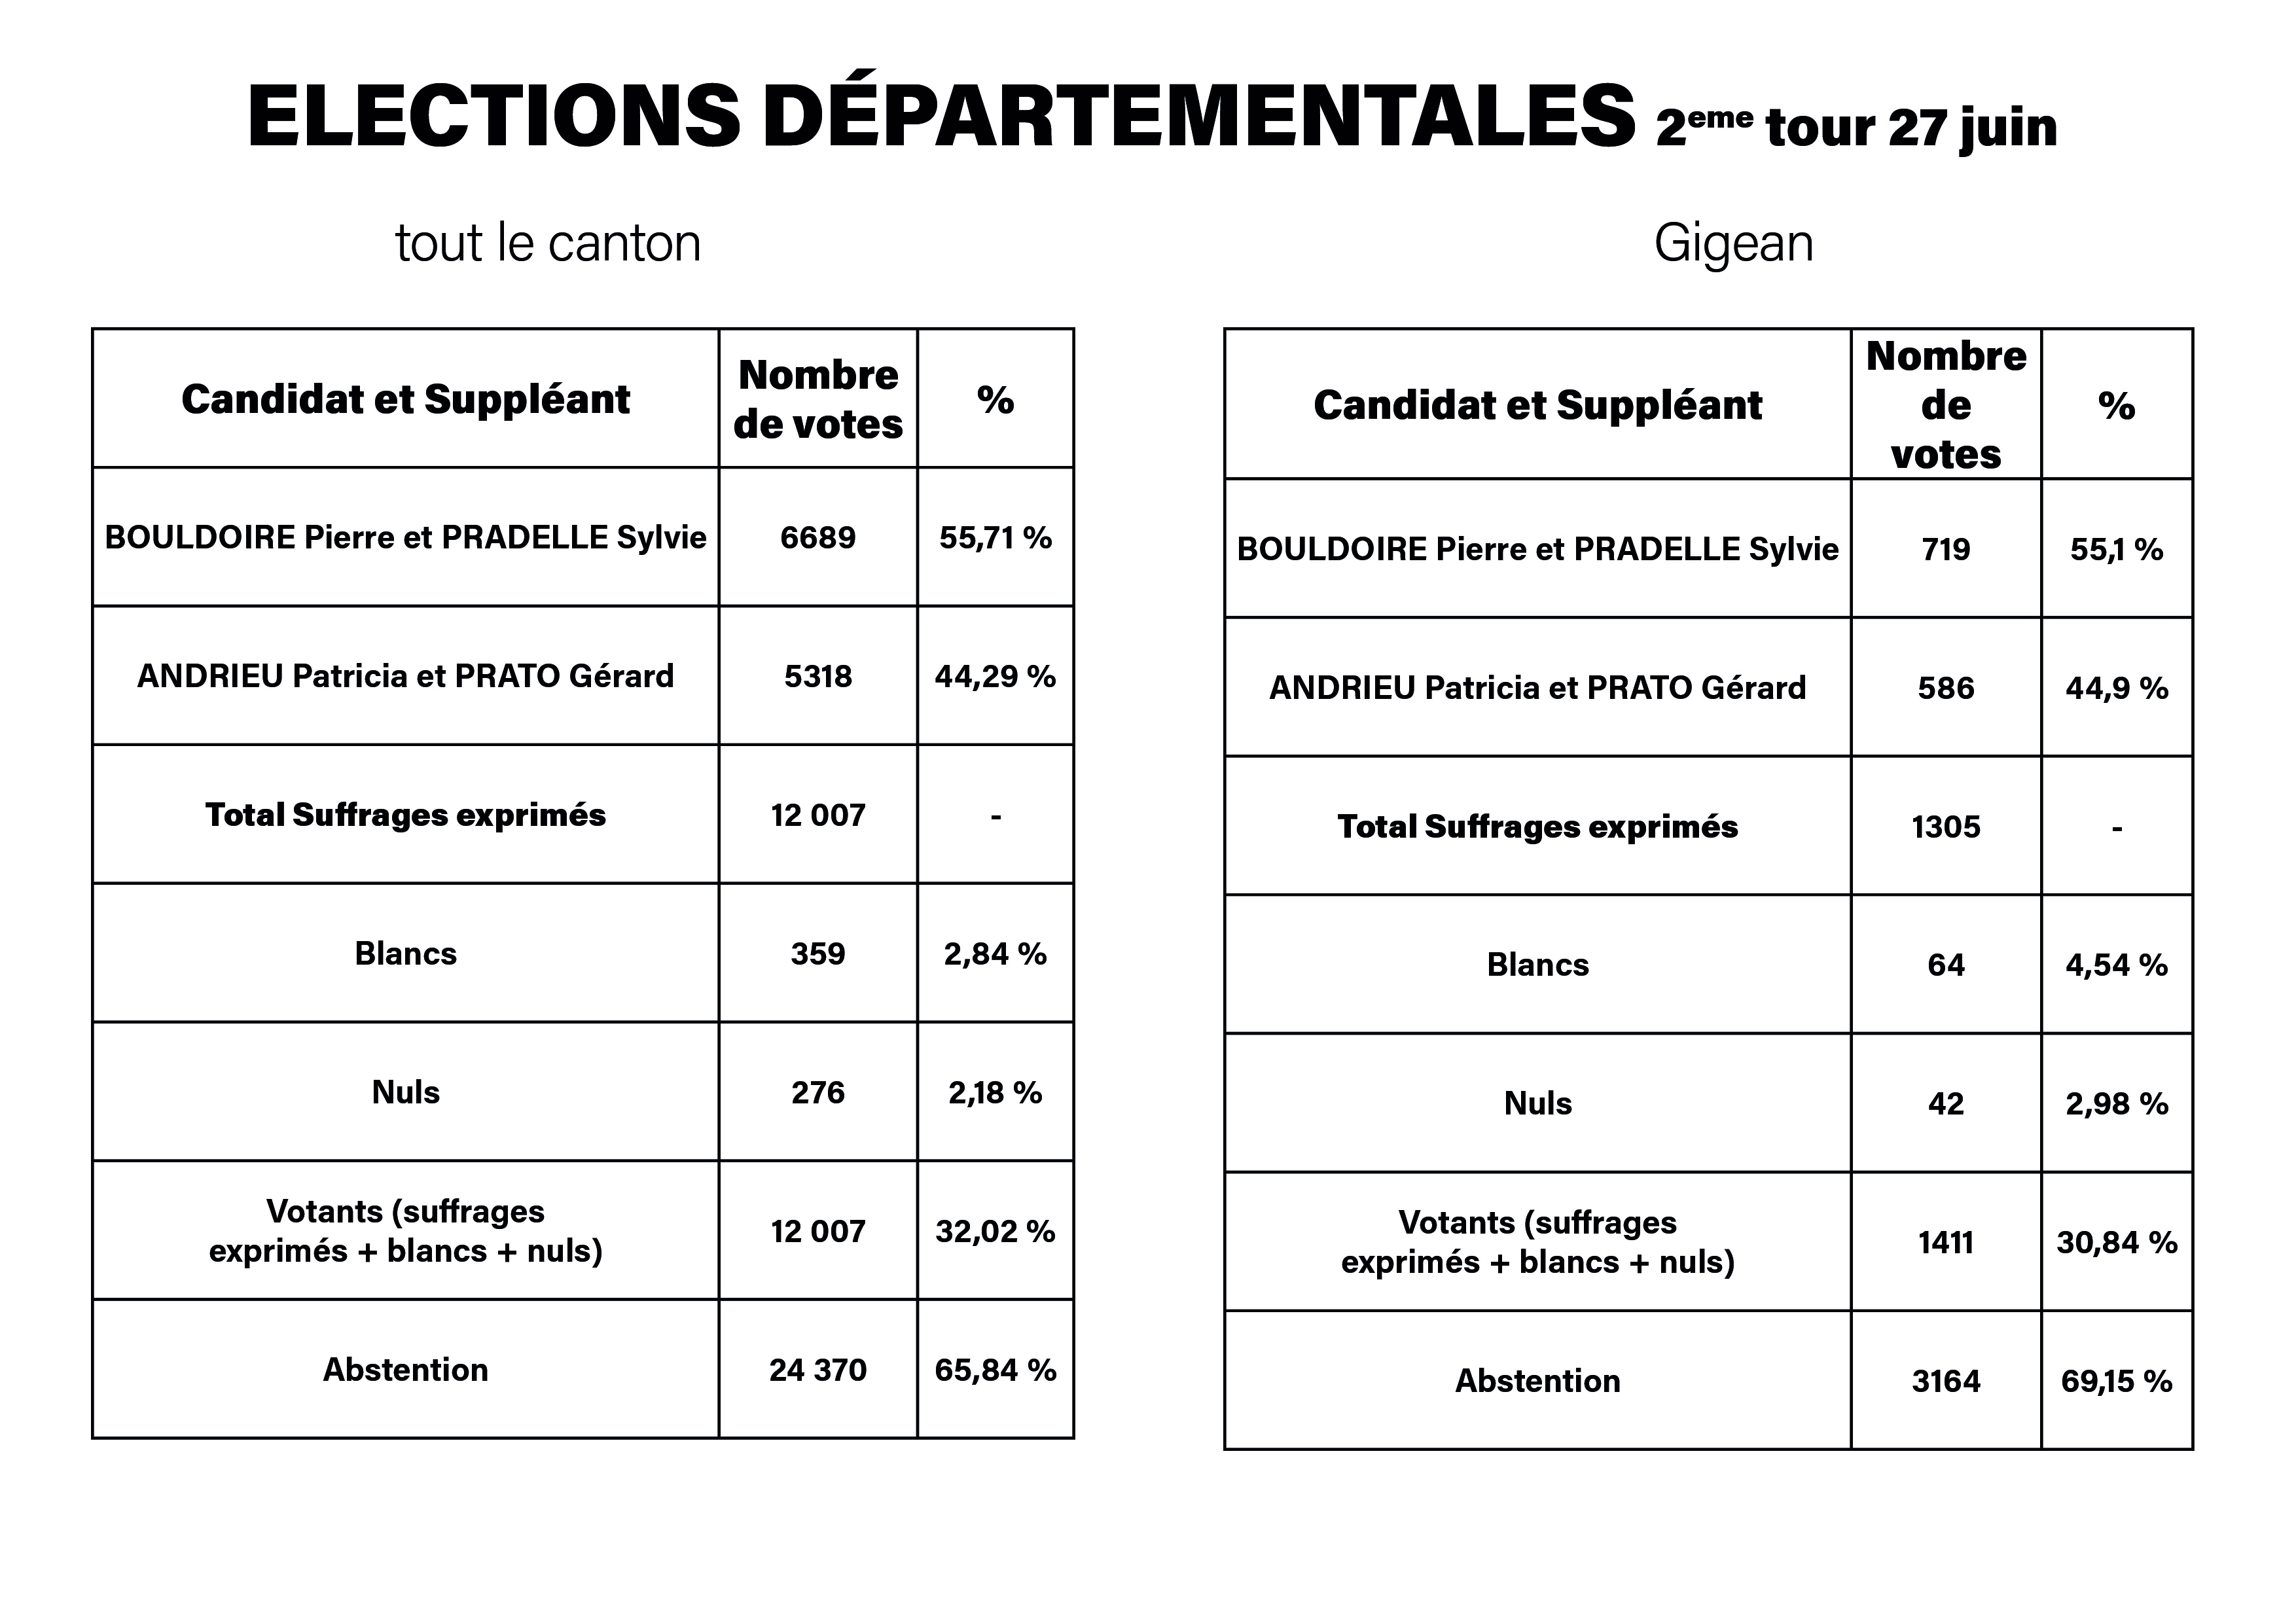 2_tour_elections_departementales.jpg